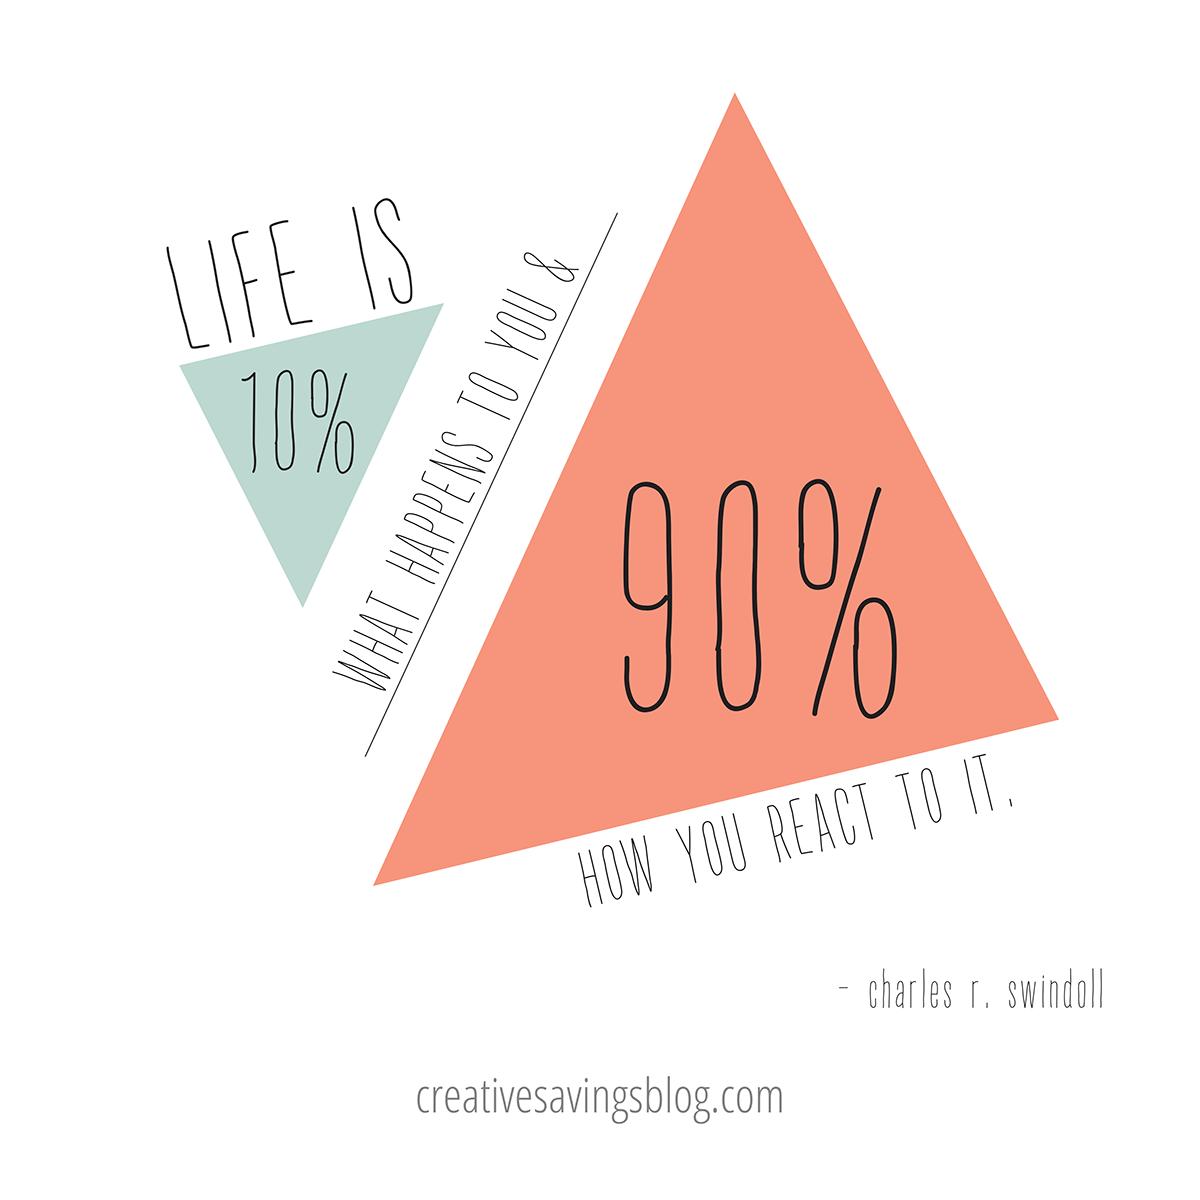 Creative Savings Blog